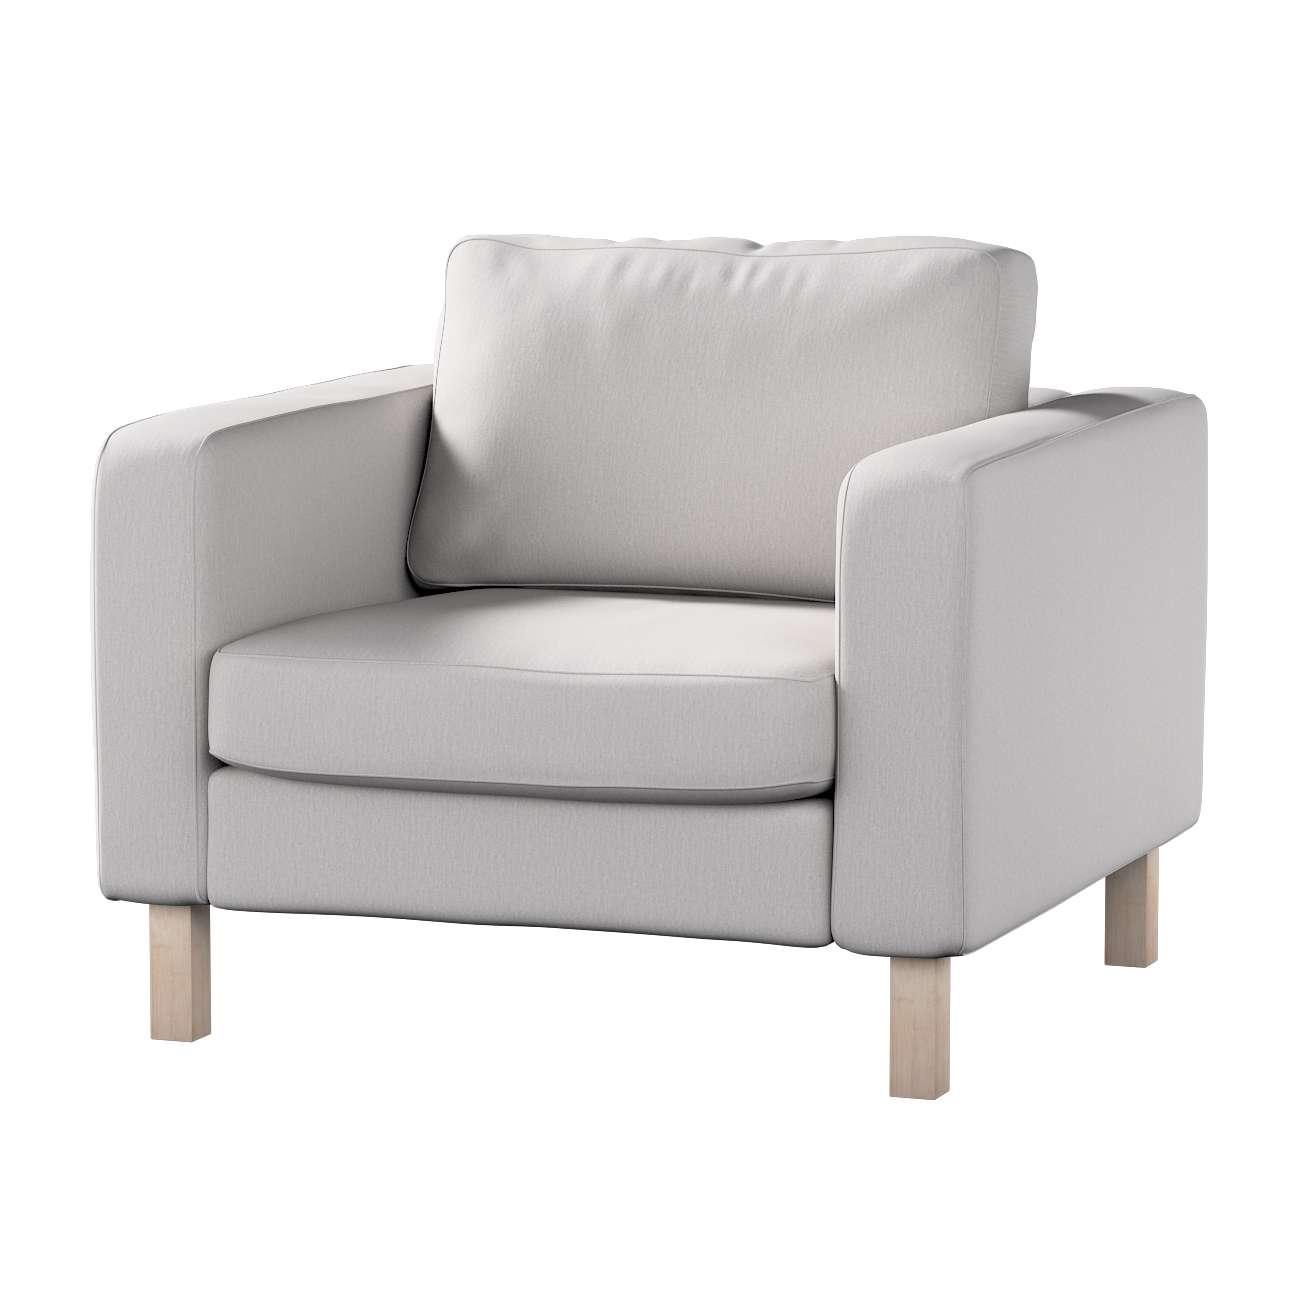 Pokrowiec na fotel Karlstad, krótki Fotel Karlstad w kolekcji Chenille, tkanina: 702-23